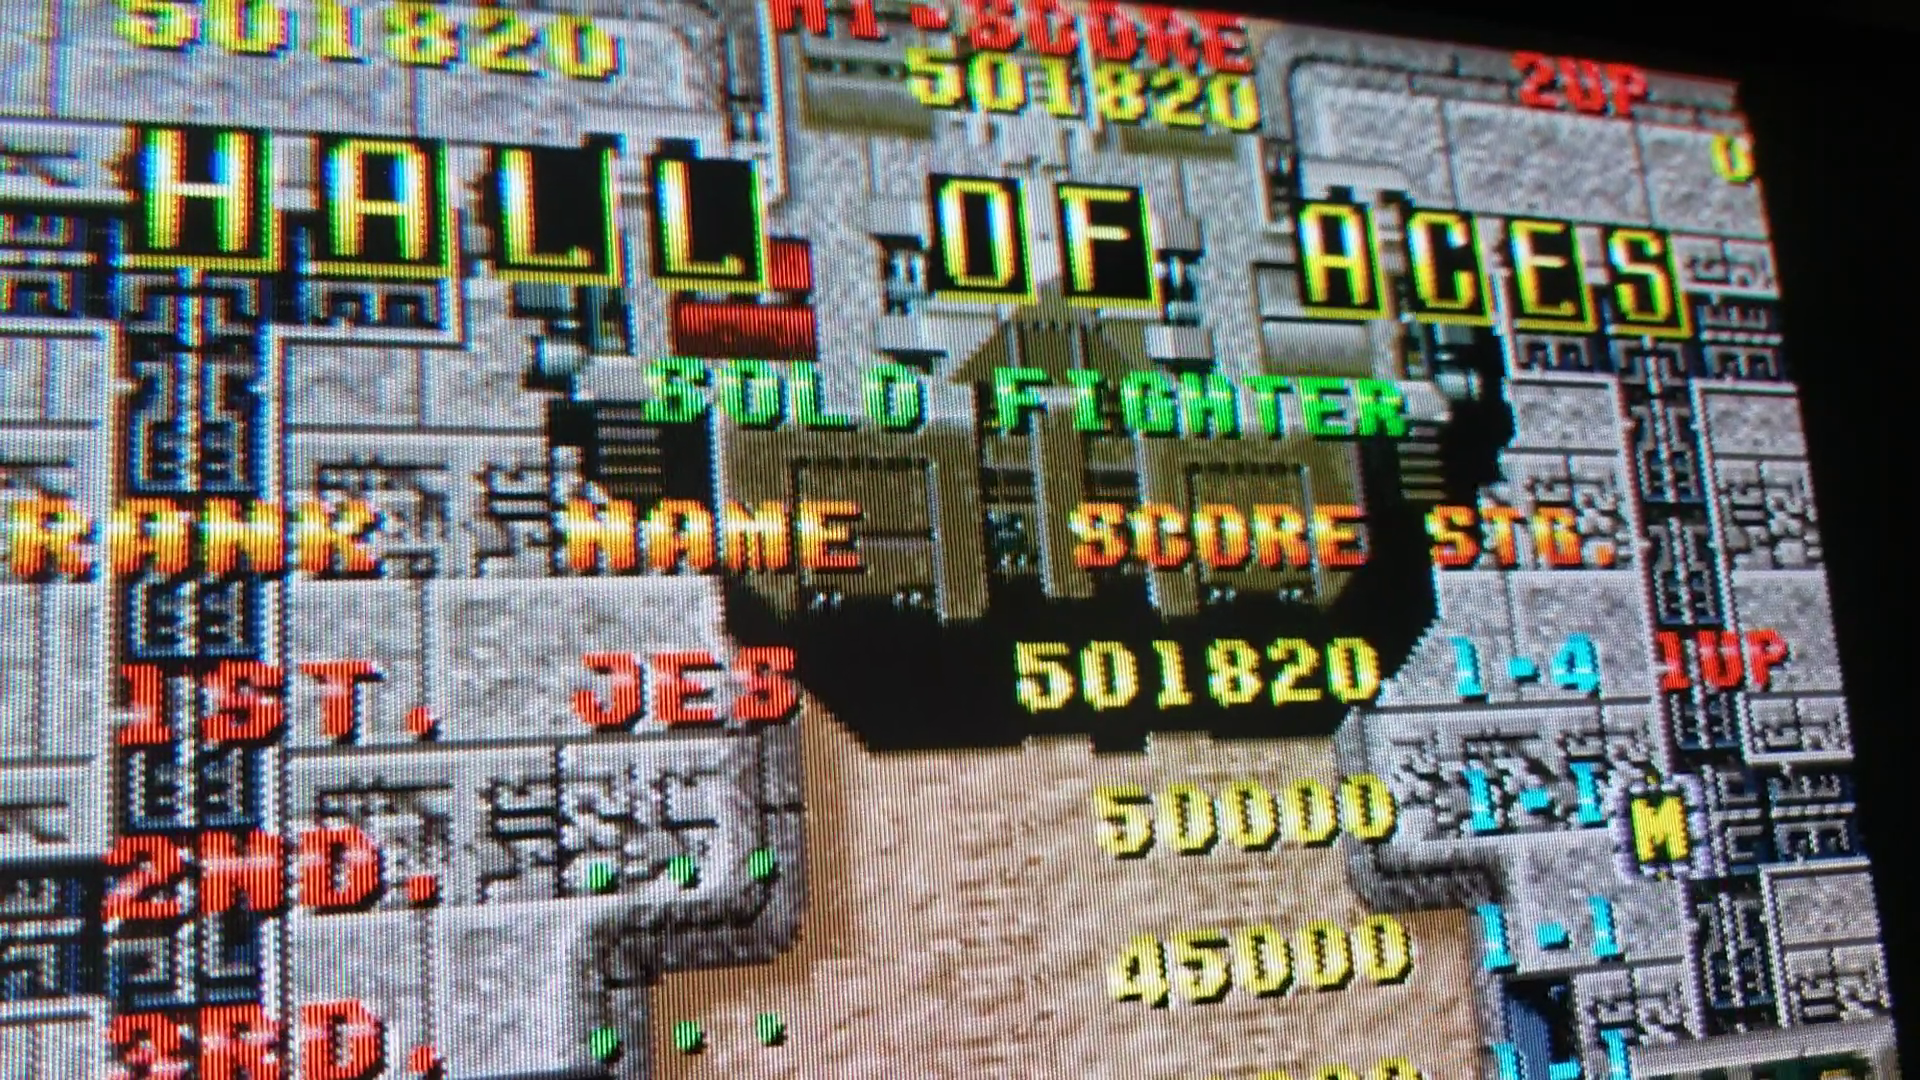 JES: Raiden (Arcade Emulated / M.A.M.E.) 501,820 points on 2020-09-11 18:31:21